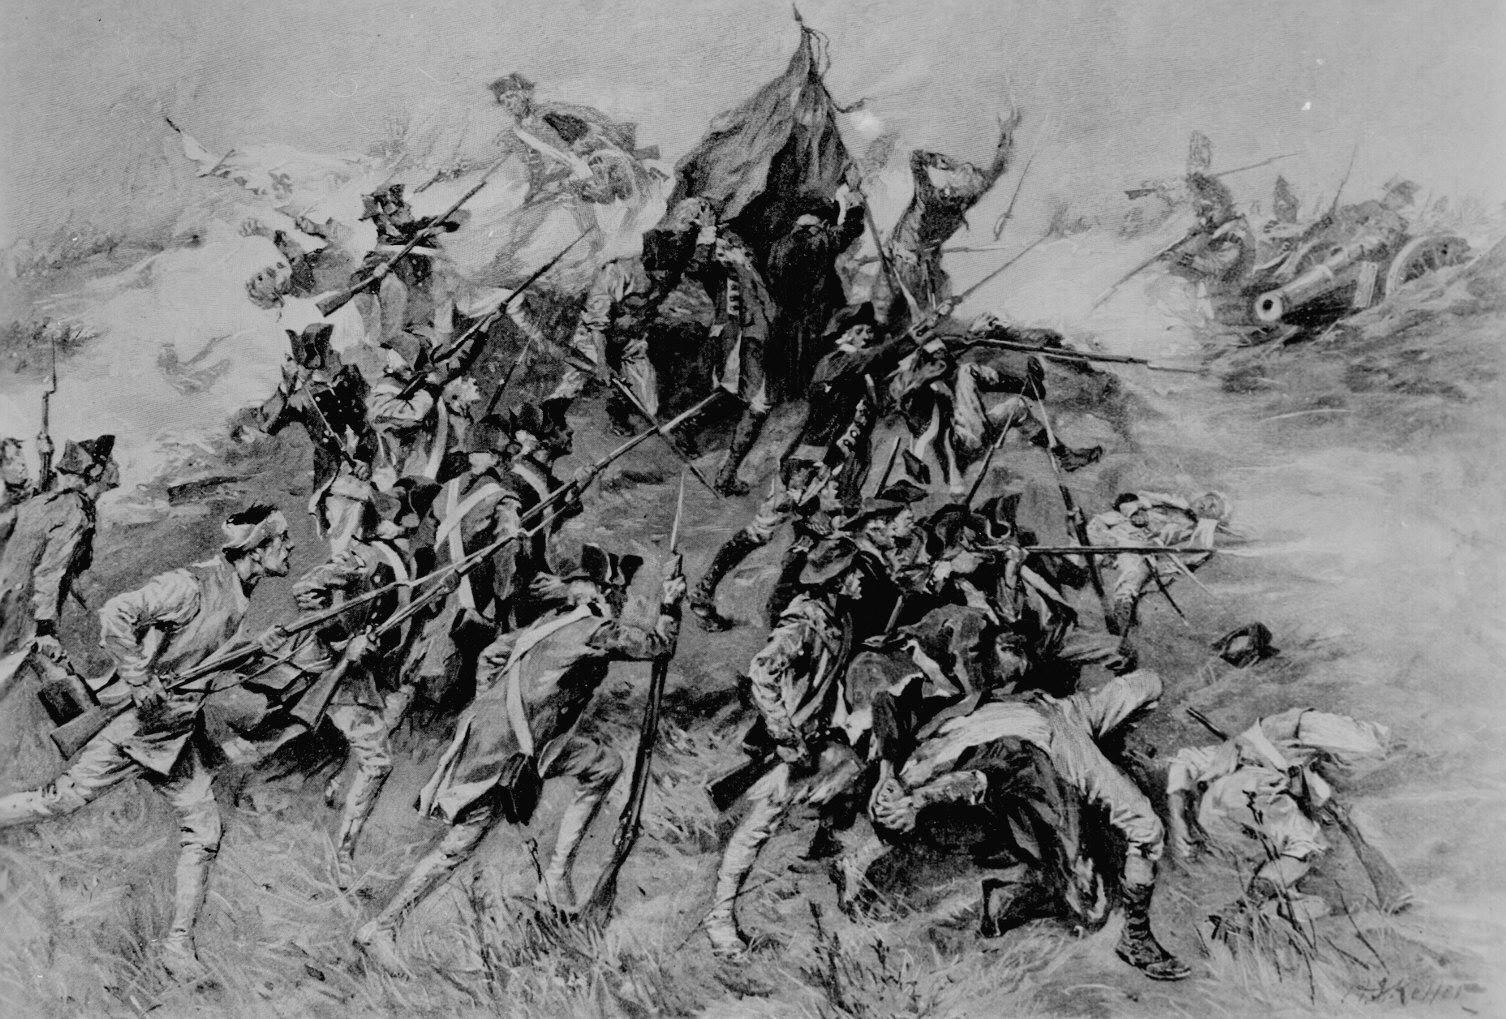 siege of savannah - wikipedia